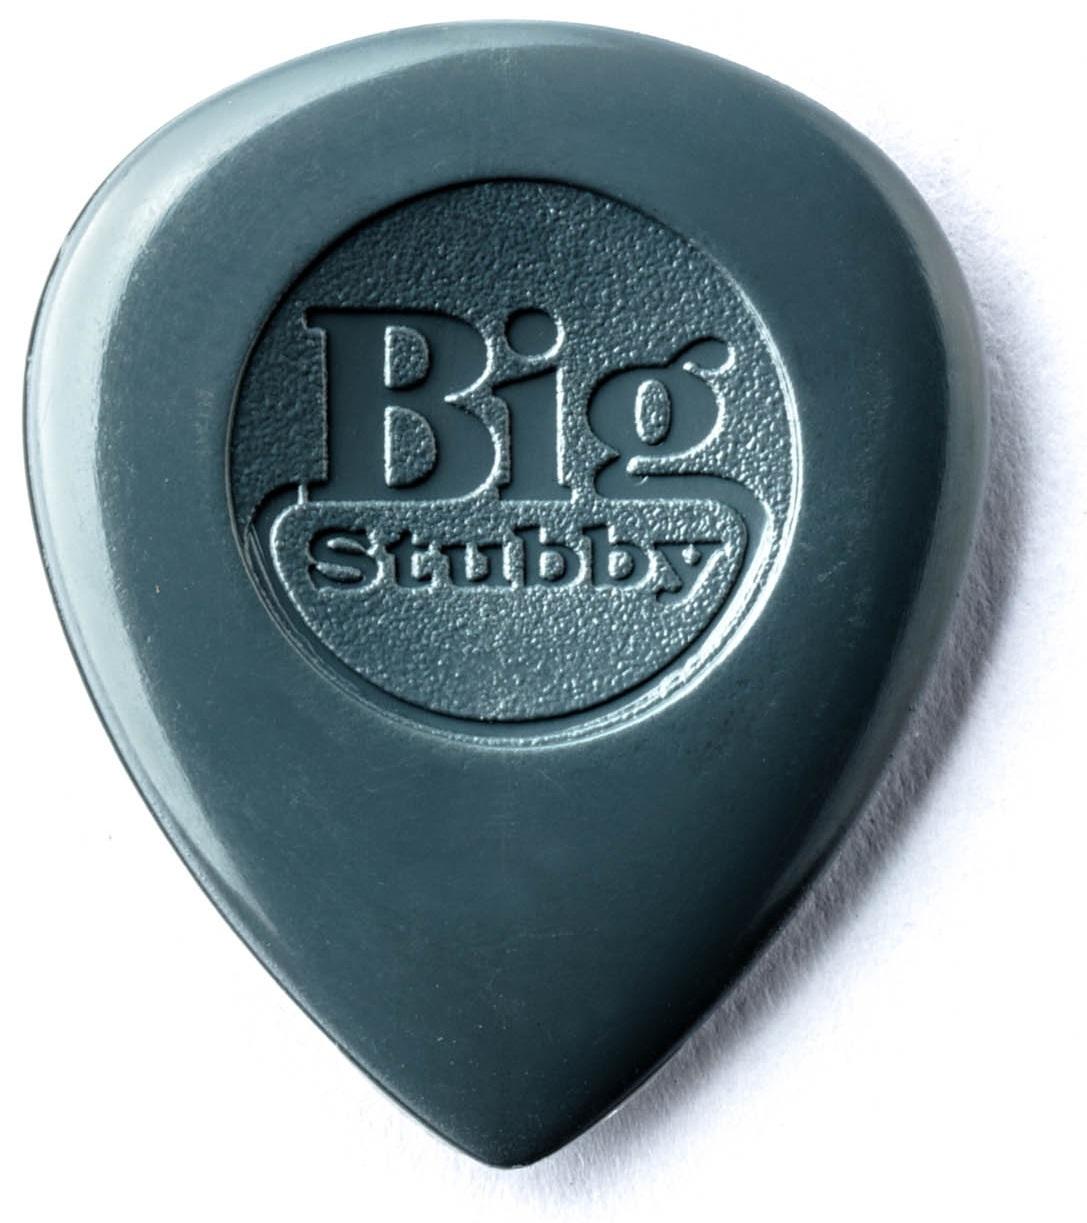 Dunlop Nylon Big Stubby 3.0